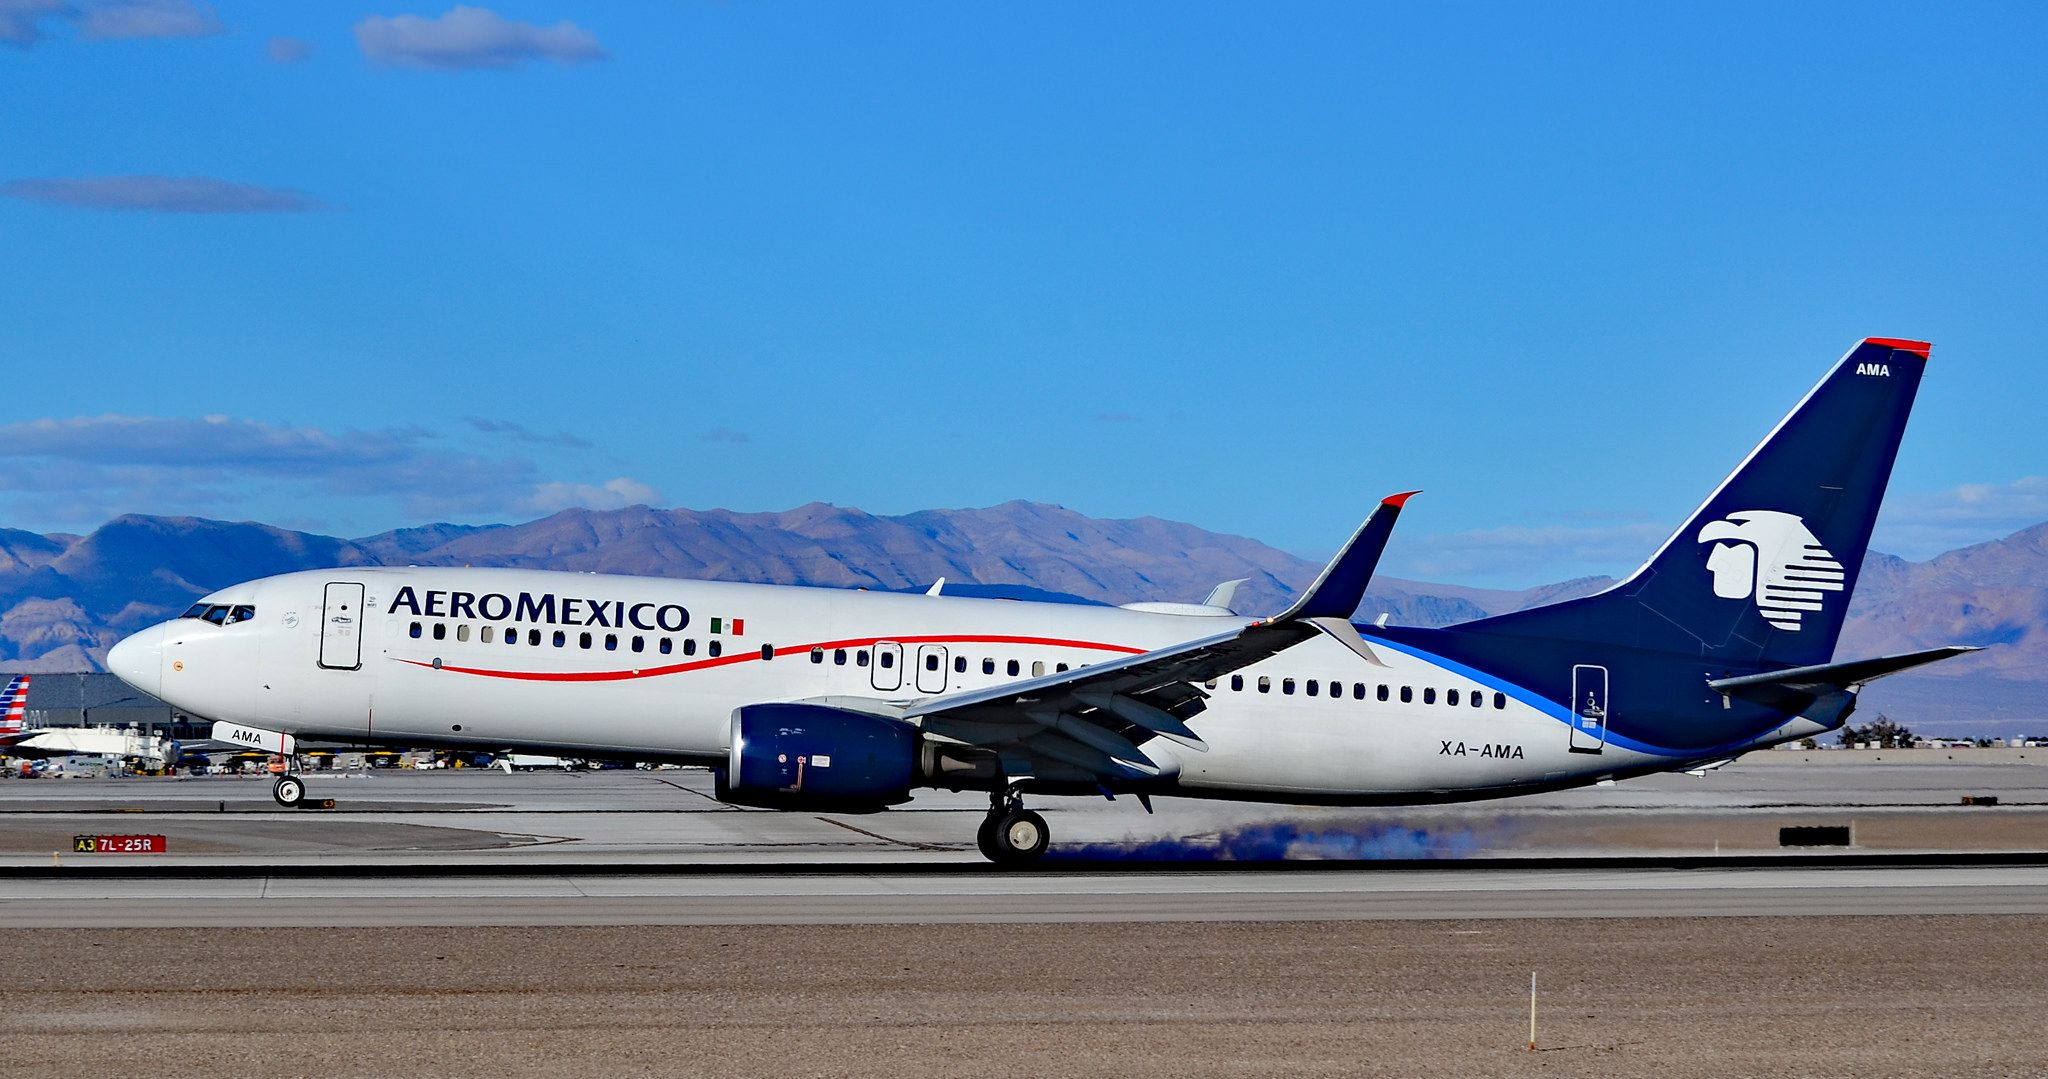 XAAMA AeroMexico 2012 Boeing 737852 (C/N 36700/4137